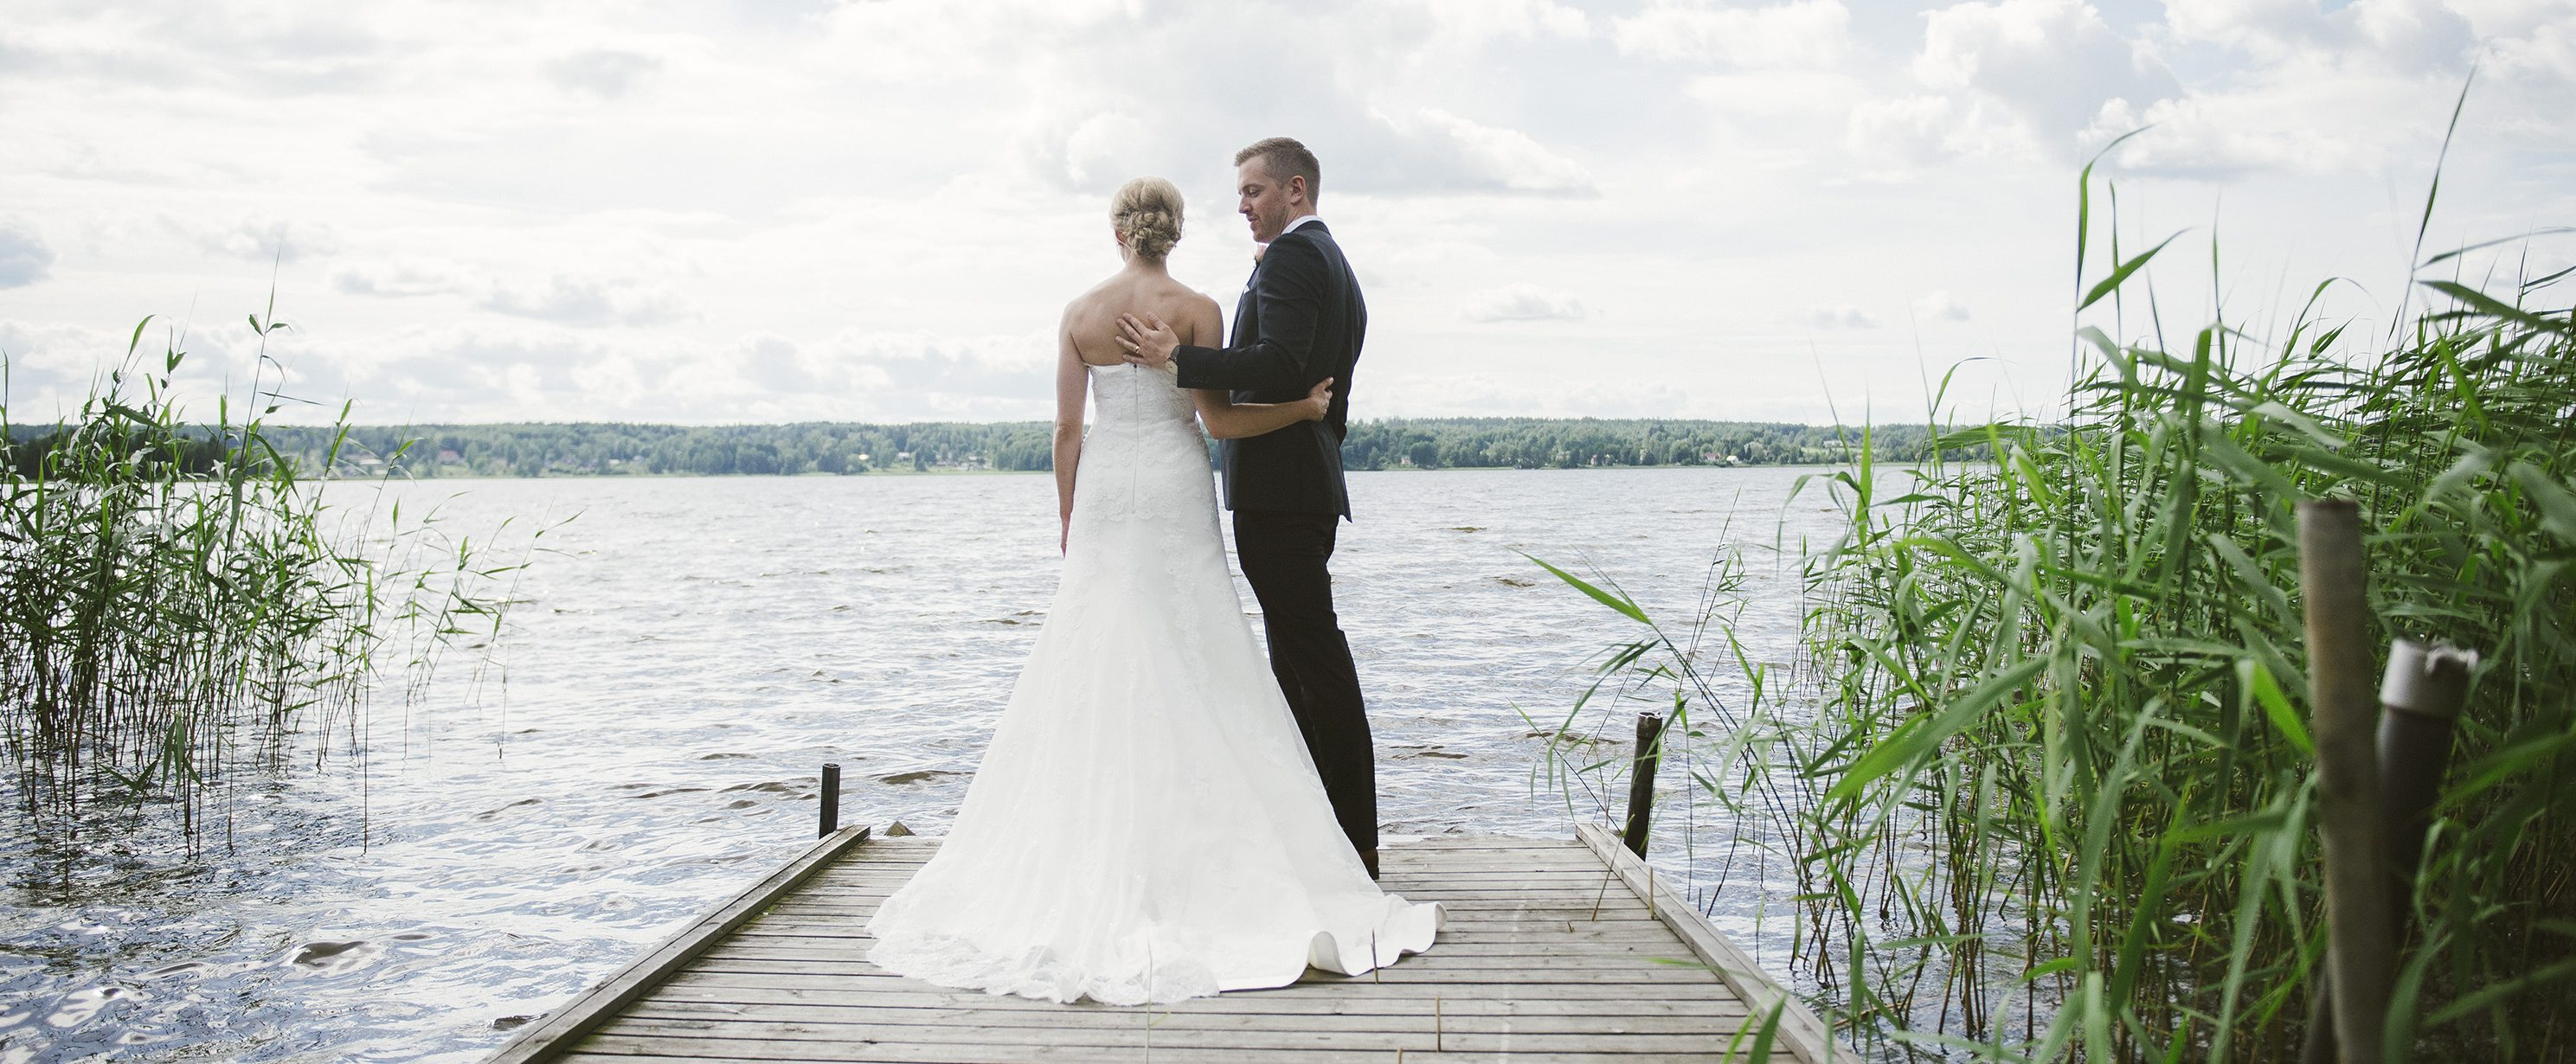 Ida Myrin fotografi - Fotograf i Värmland